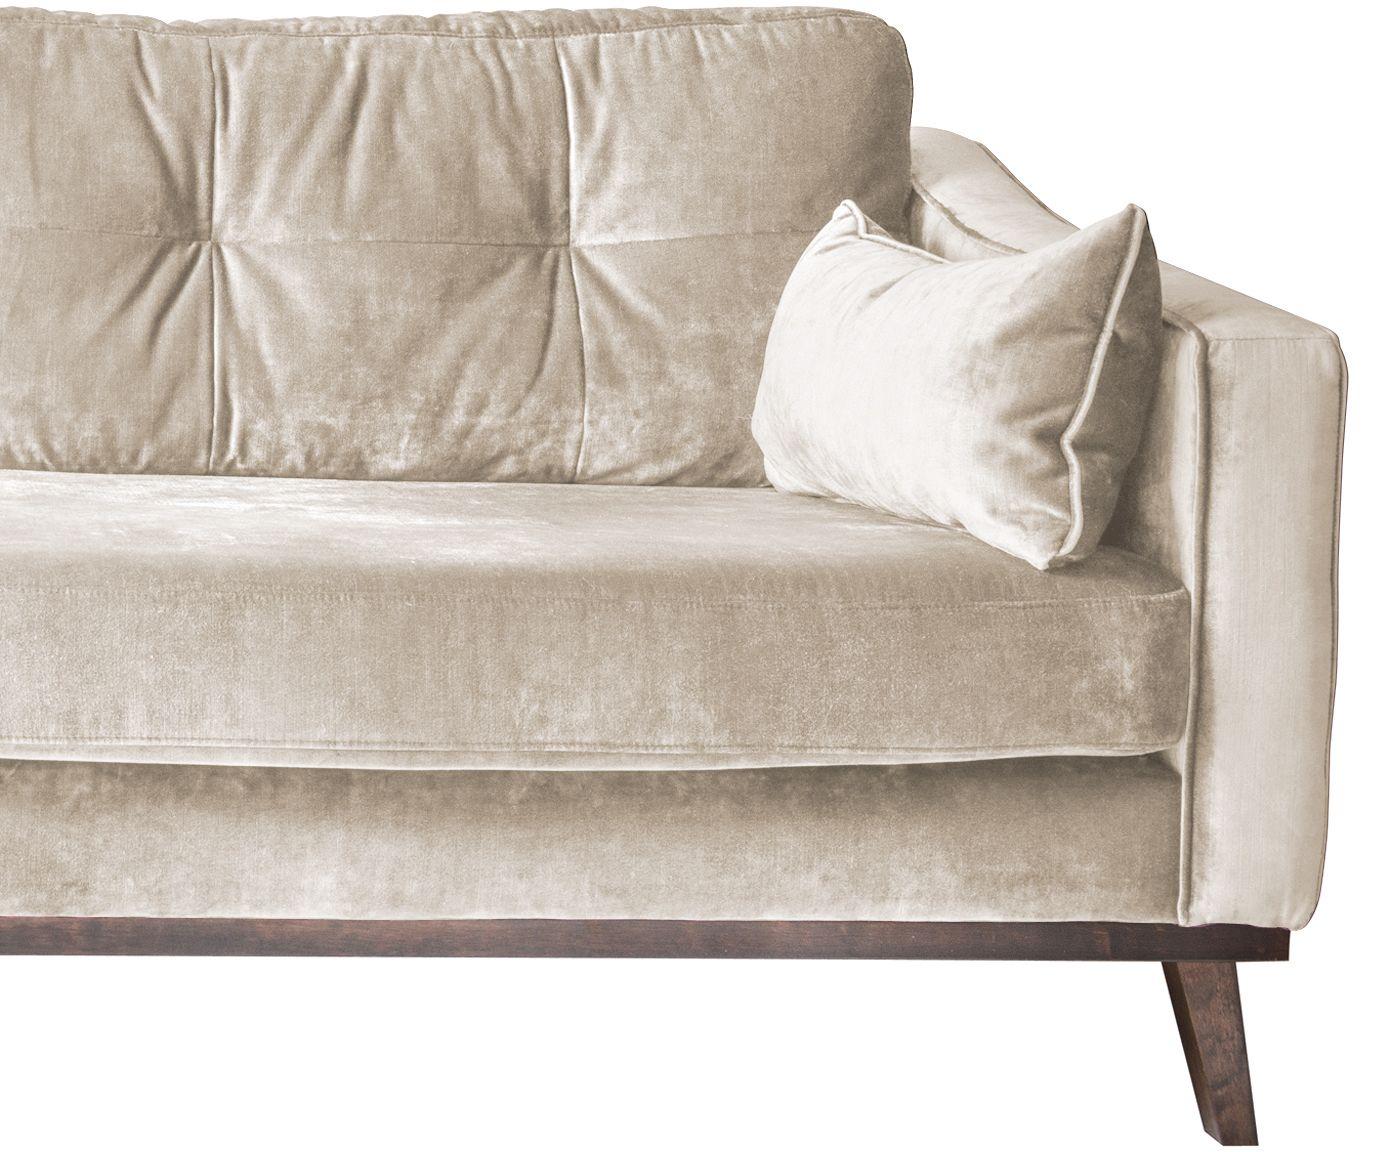 samt sofa almana 3 sitzer. Black Bedroom Furniture Sets. Home Design Ideas